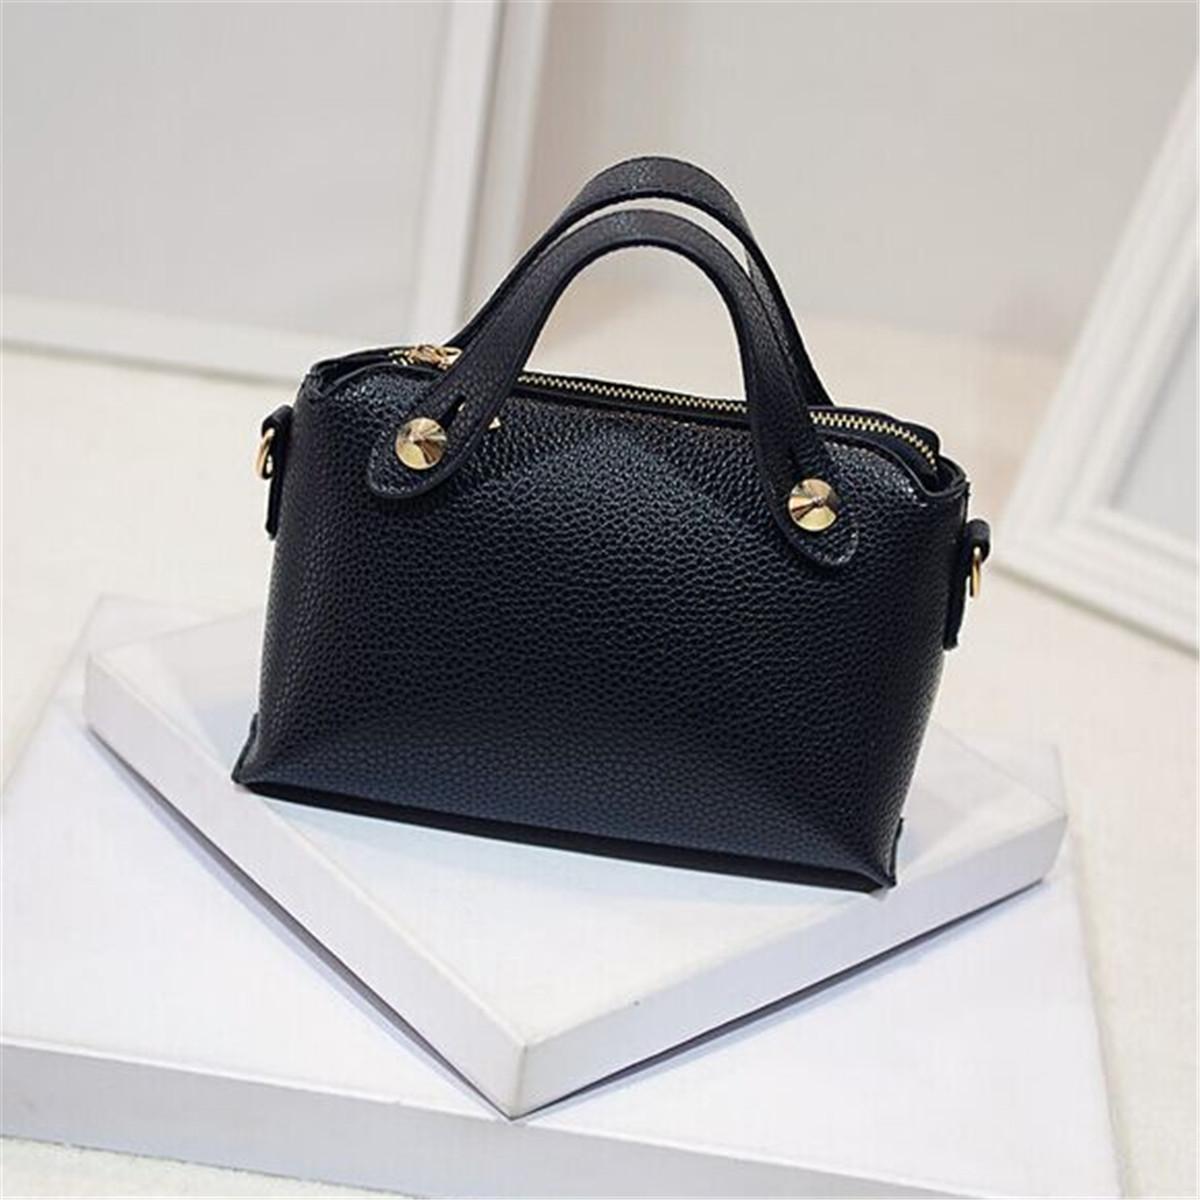 New Lady Women Fashion Handbag Leather Purse Satchel Messenger Shoulder Bag Tote